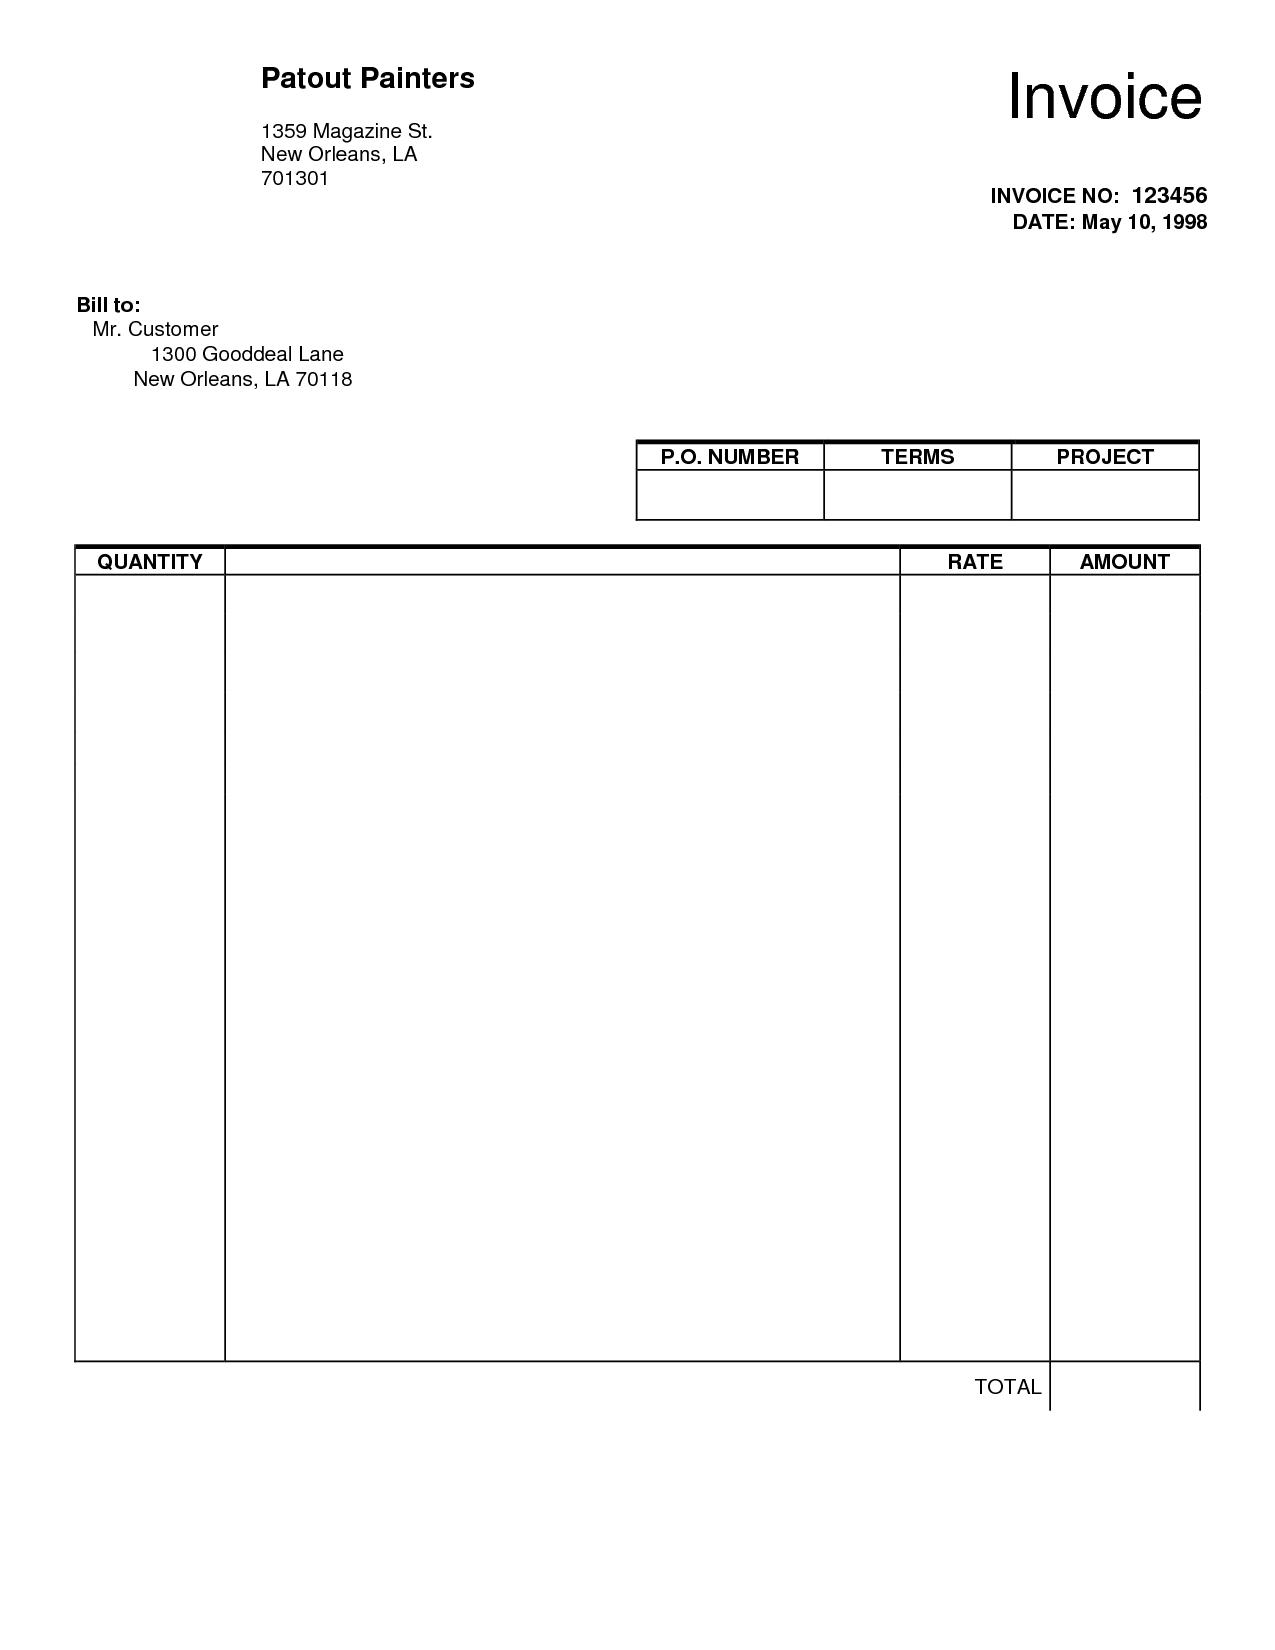 blank invoice pdf resume template info blank invoice pdf download free